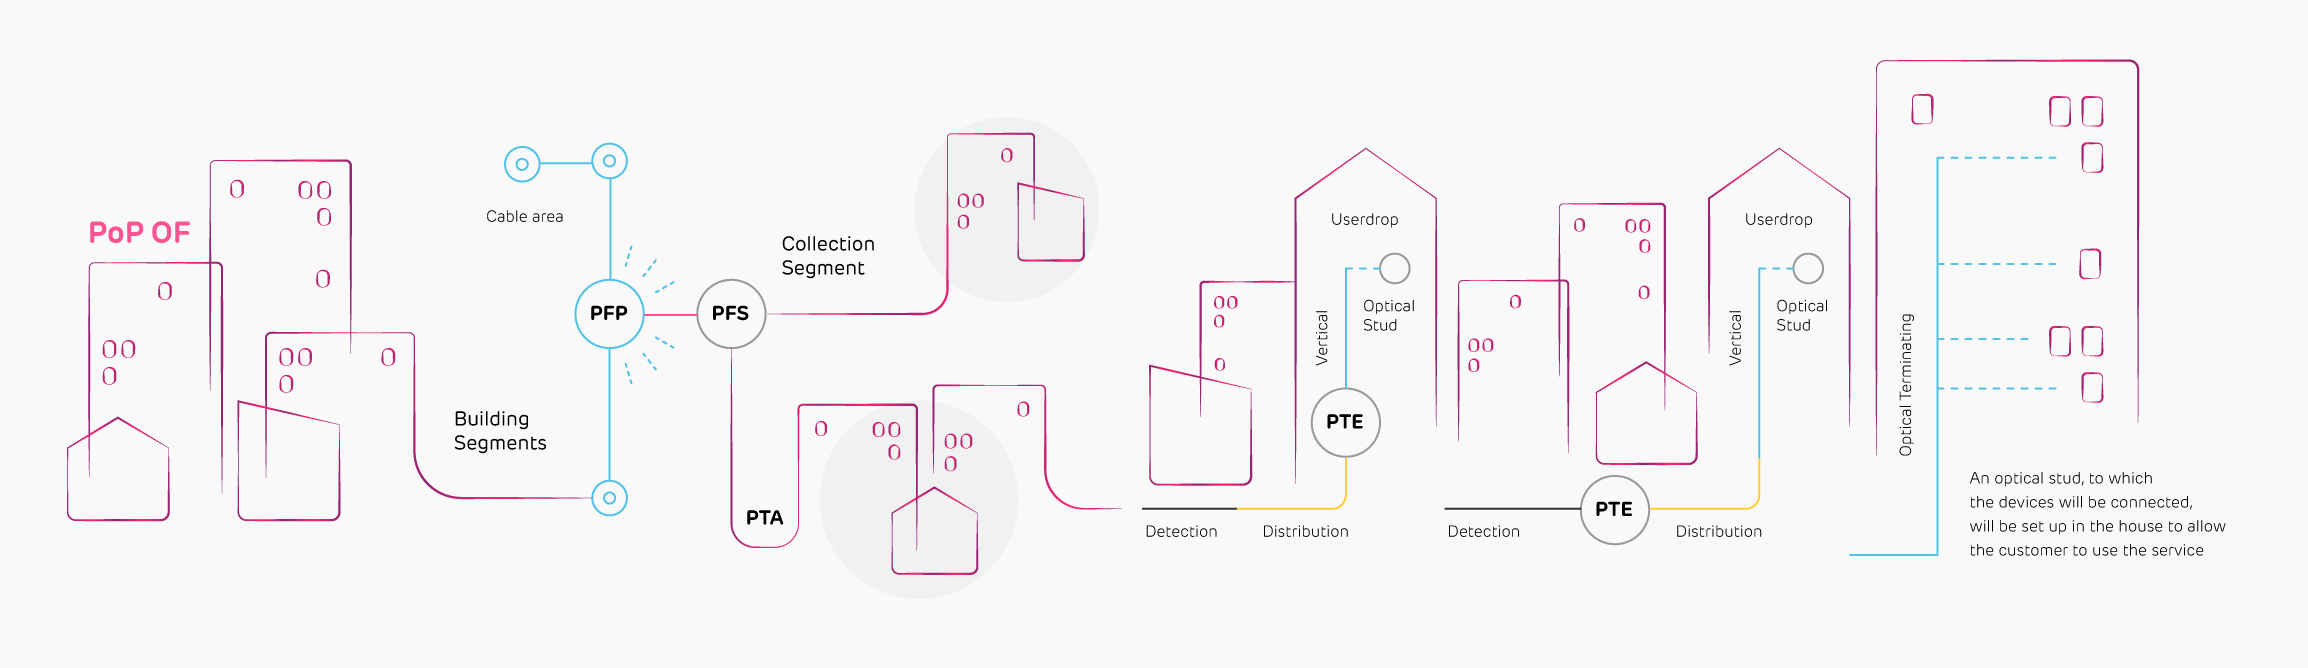 Architettura GPON | Open Fiber